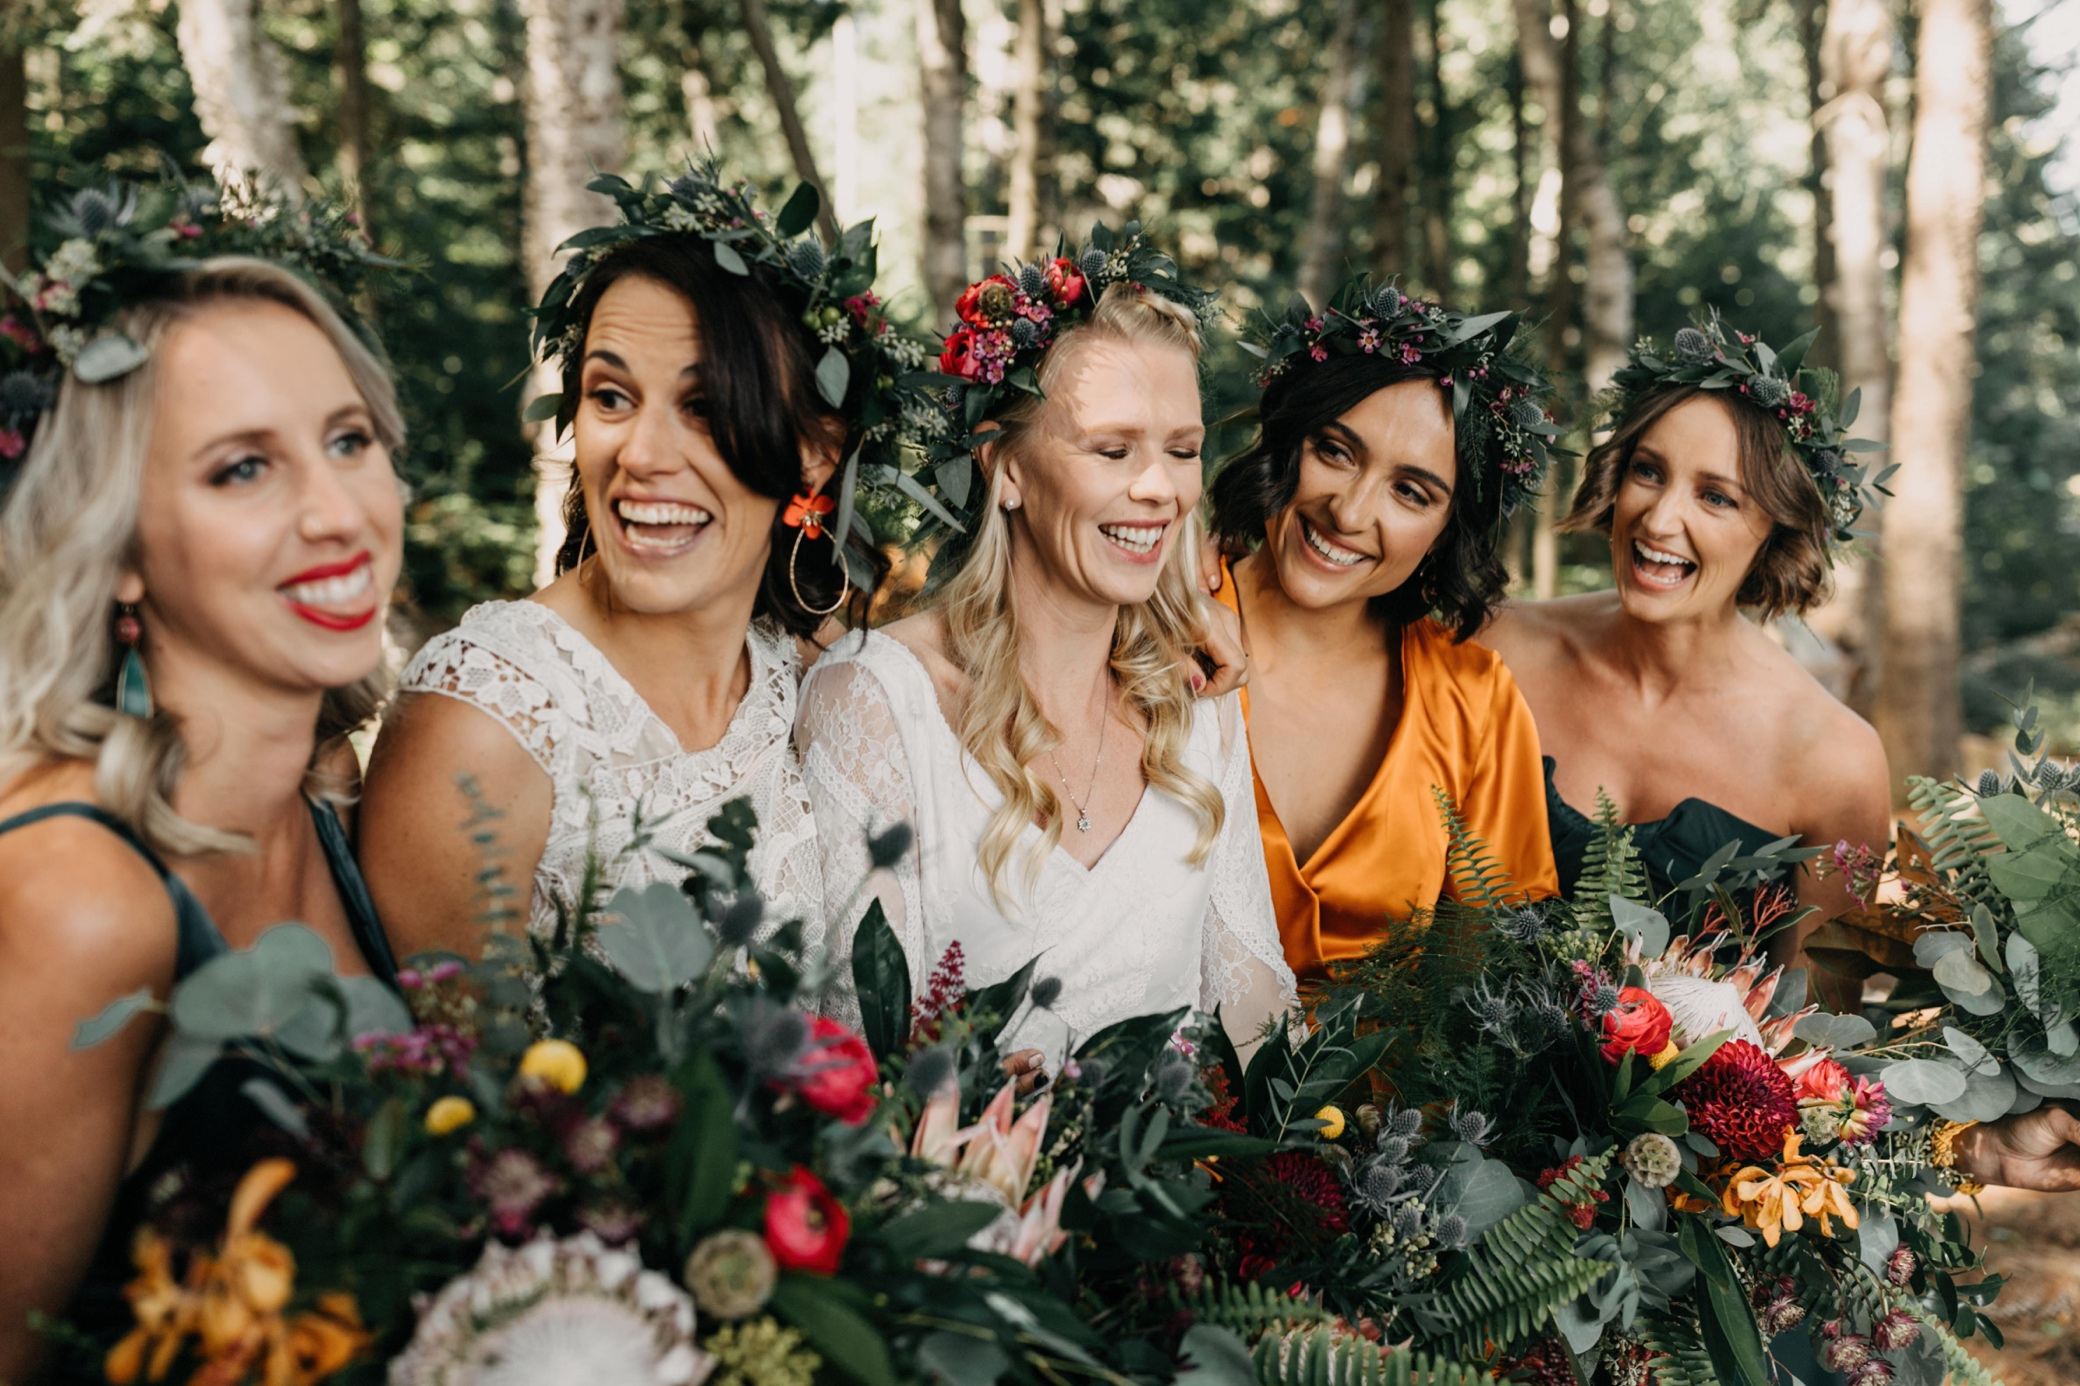 049_Huntsville Wedding  (193 of 689)_Documentary_photographer_Ontario_Northern_Cottage_Wedding_Wildflower_Hunstville.jpg